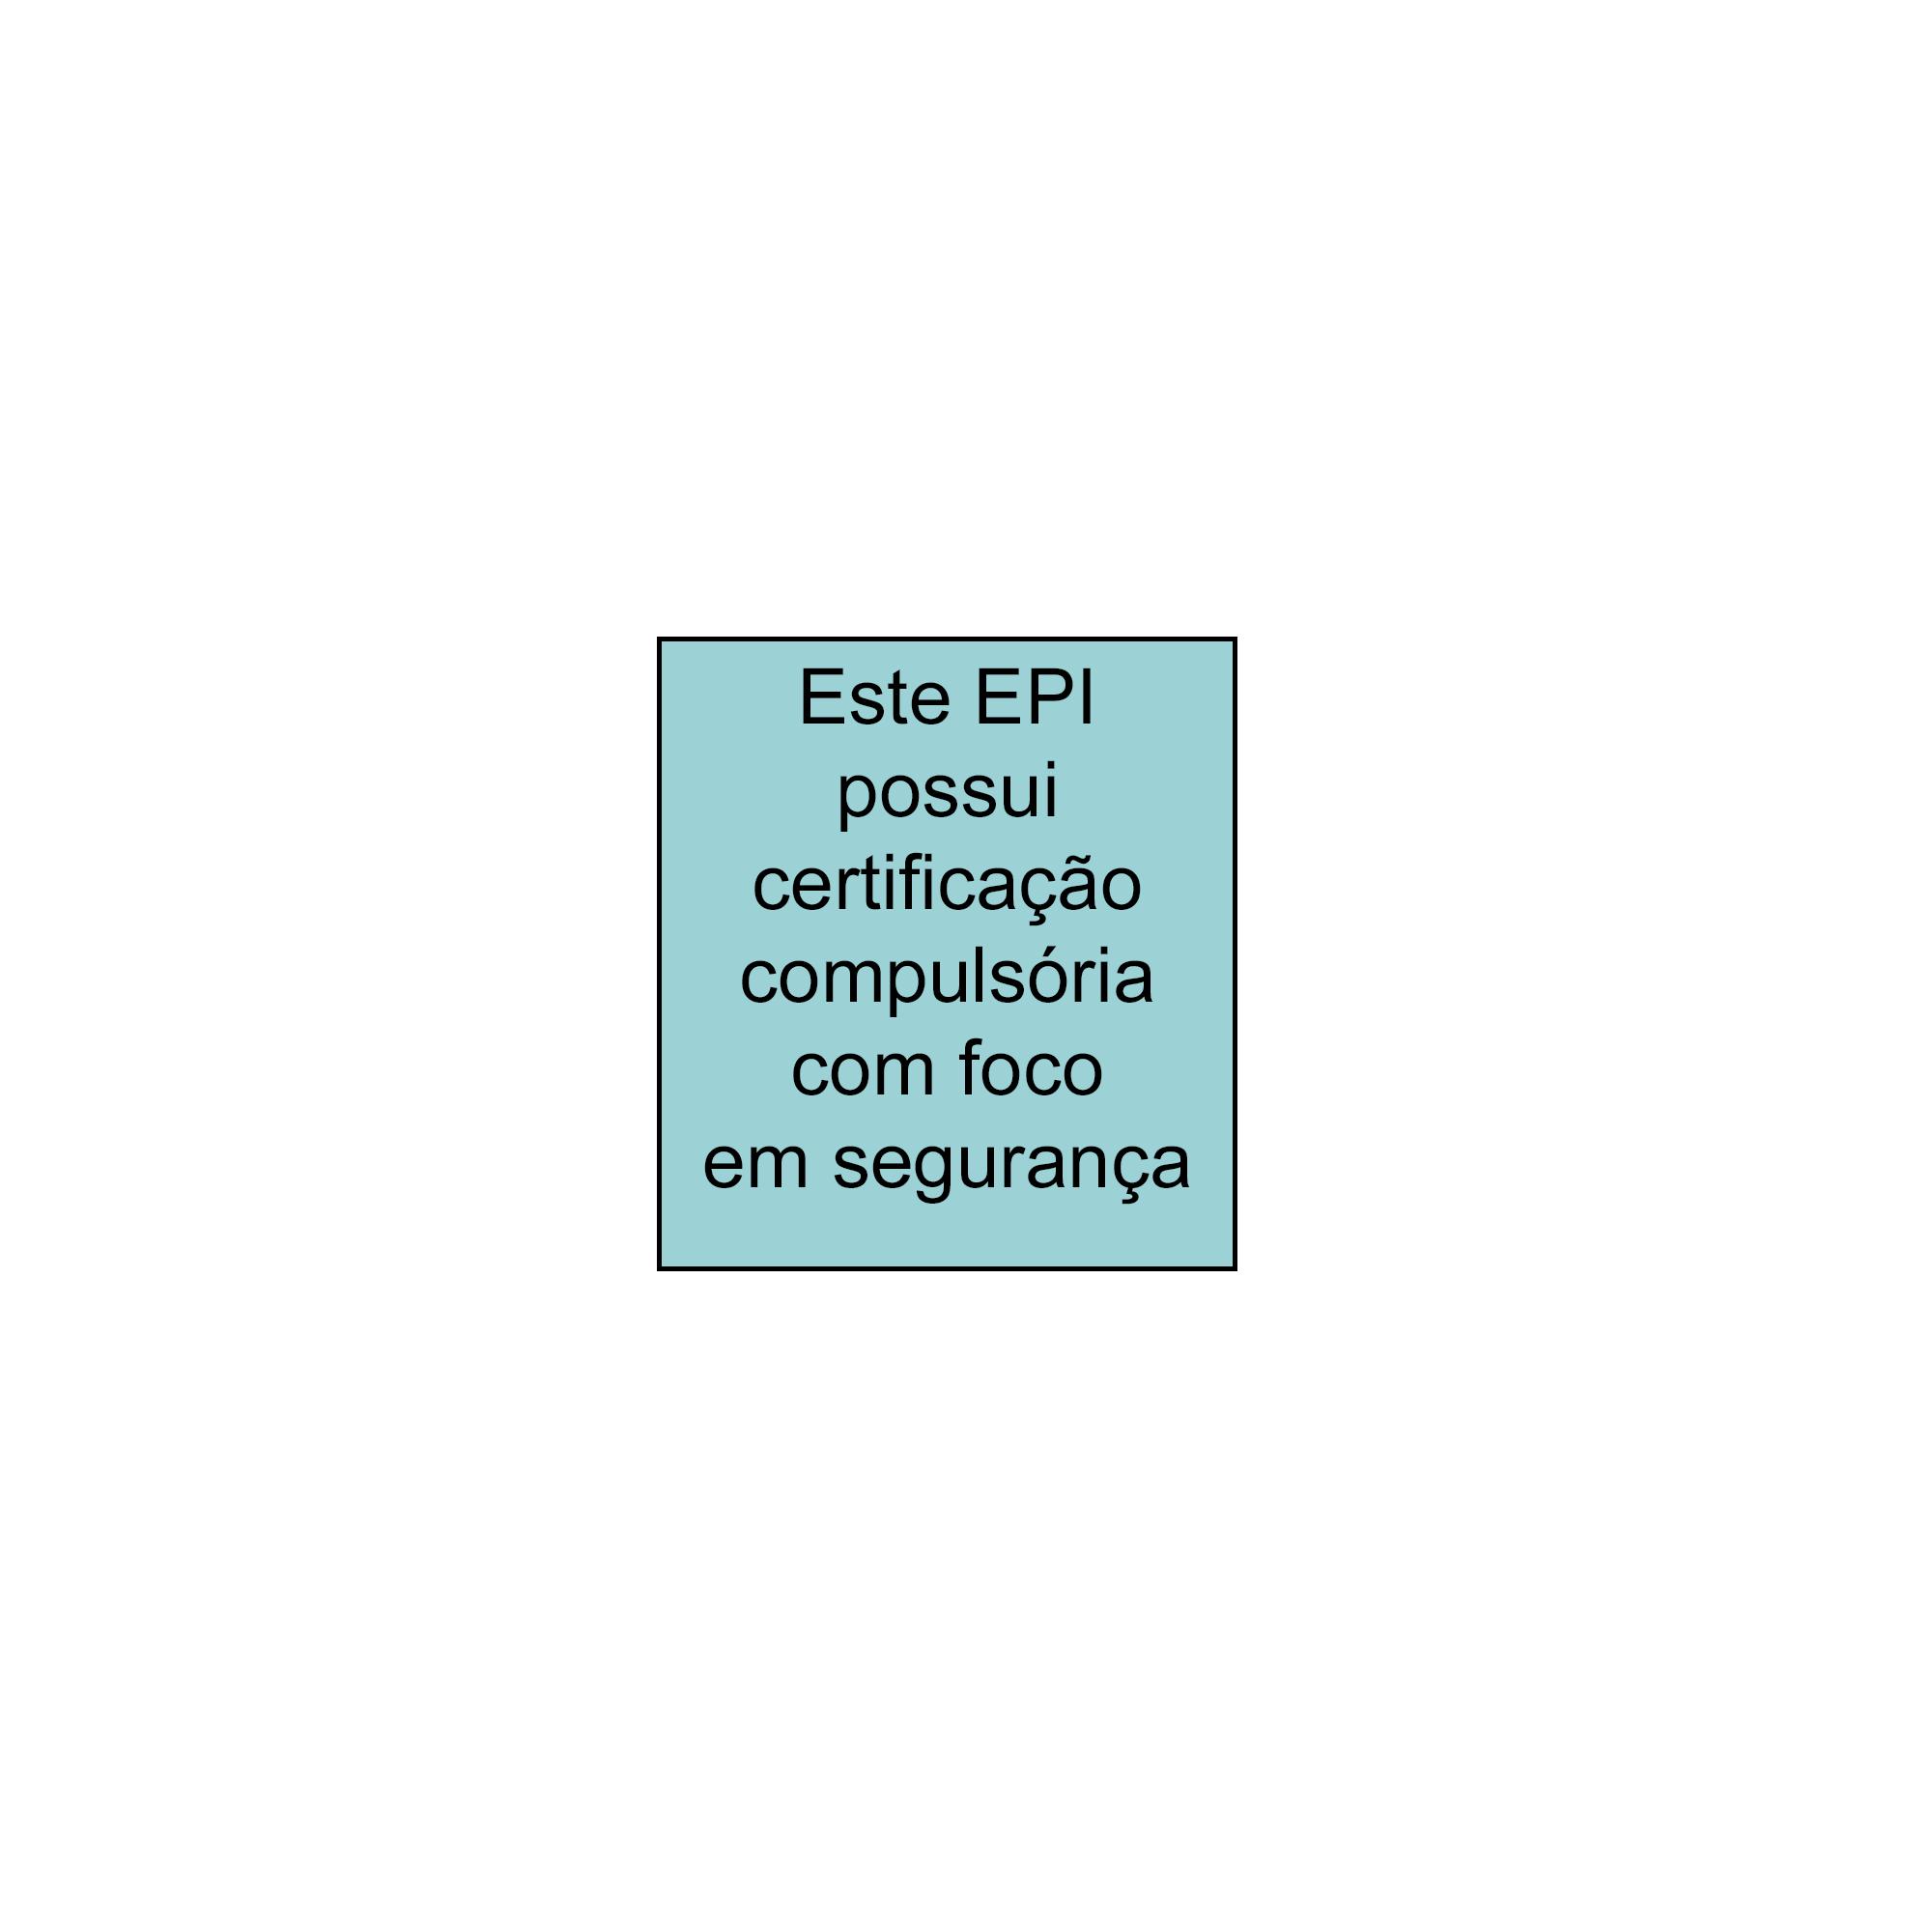 CAPACETE DE SEGURANÇA ABA FRONTAL DELTA PLUS AZUL ESCURO  - DE PAULA EPIS